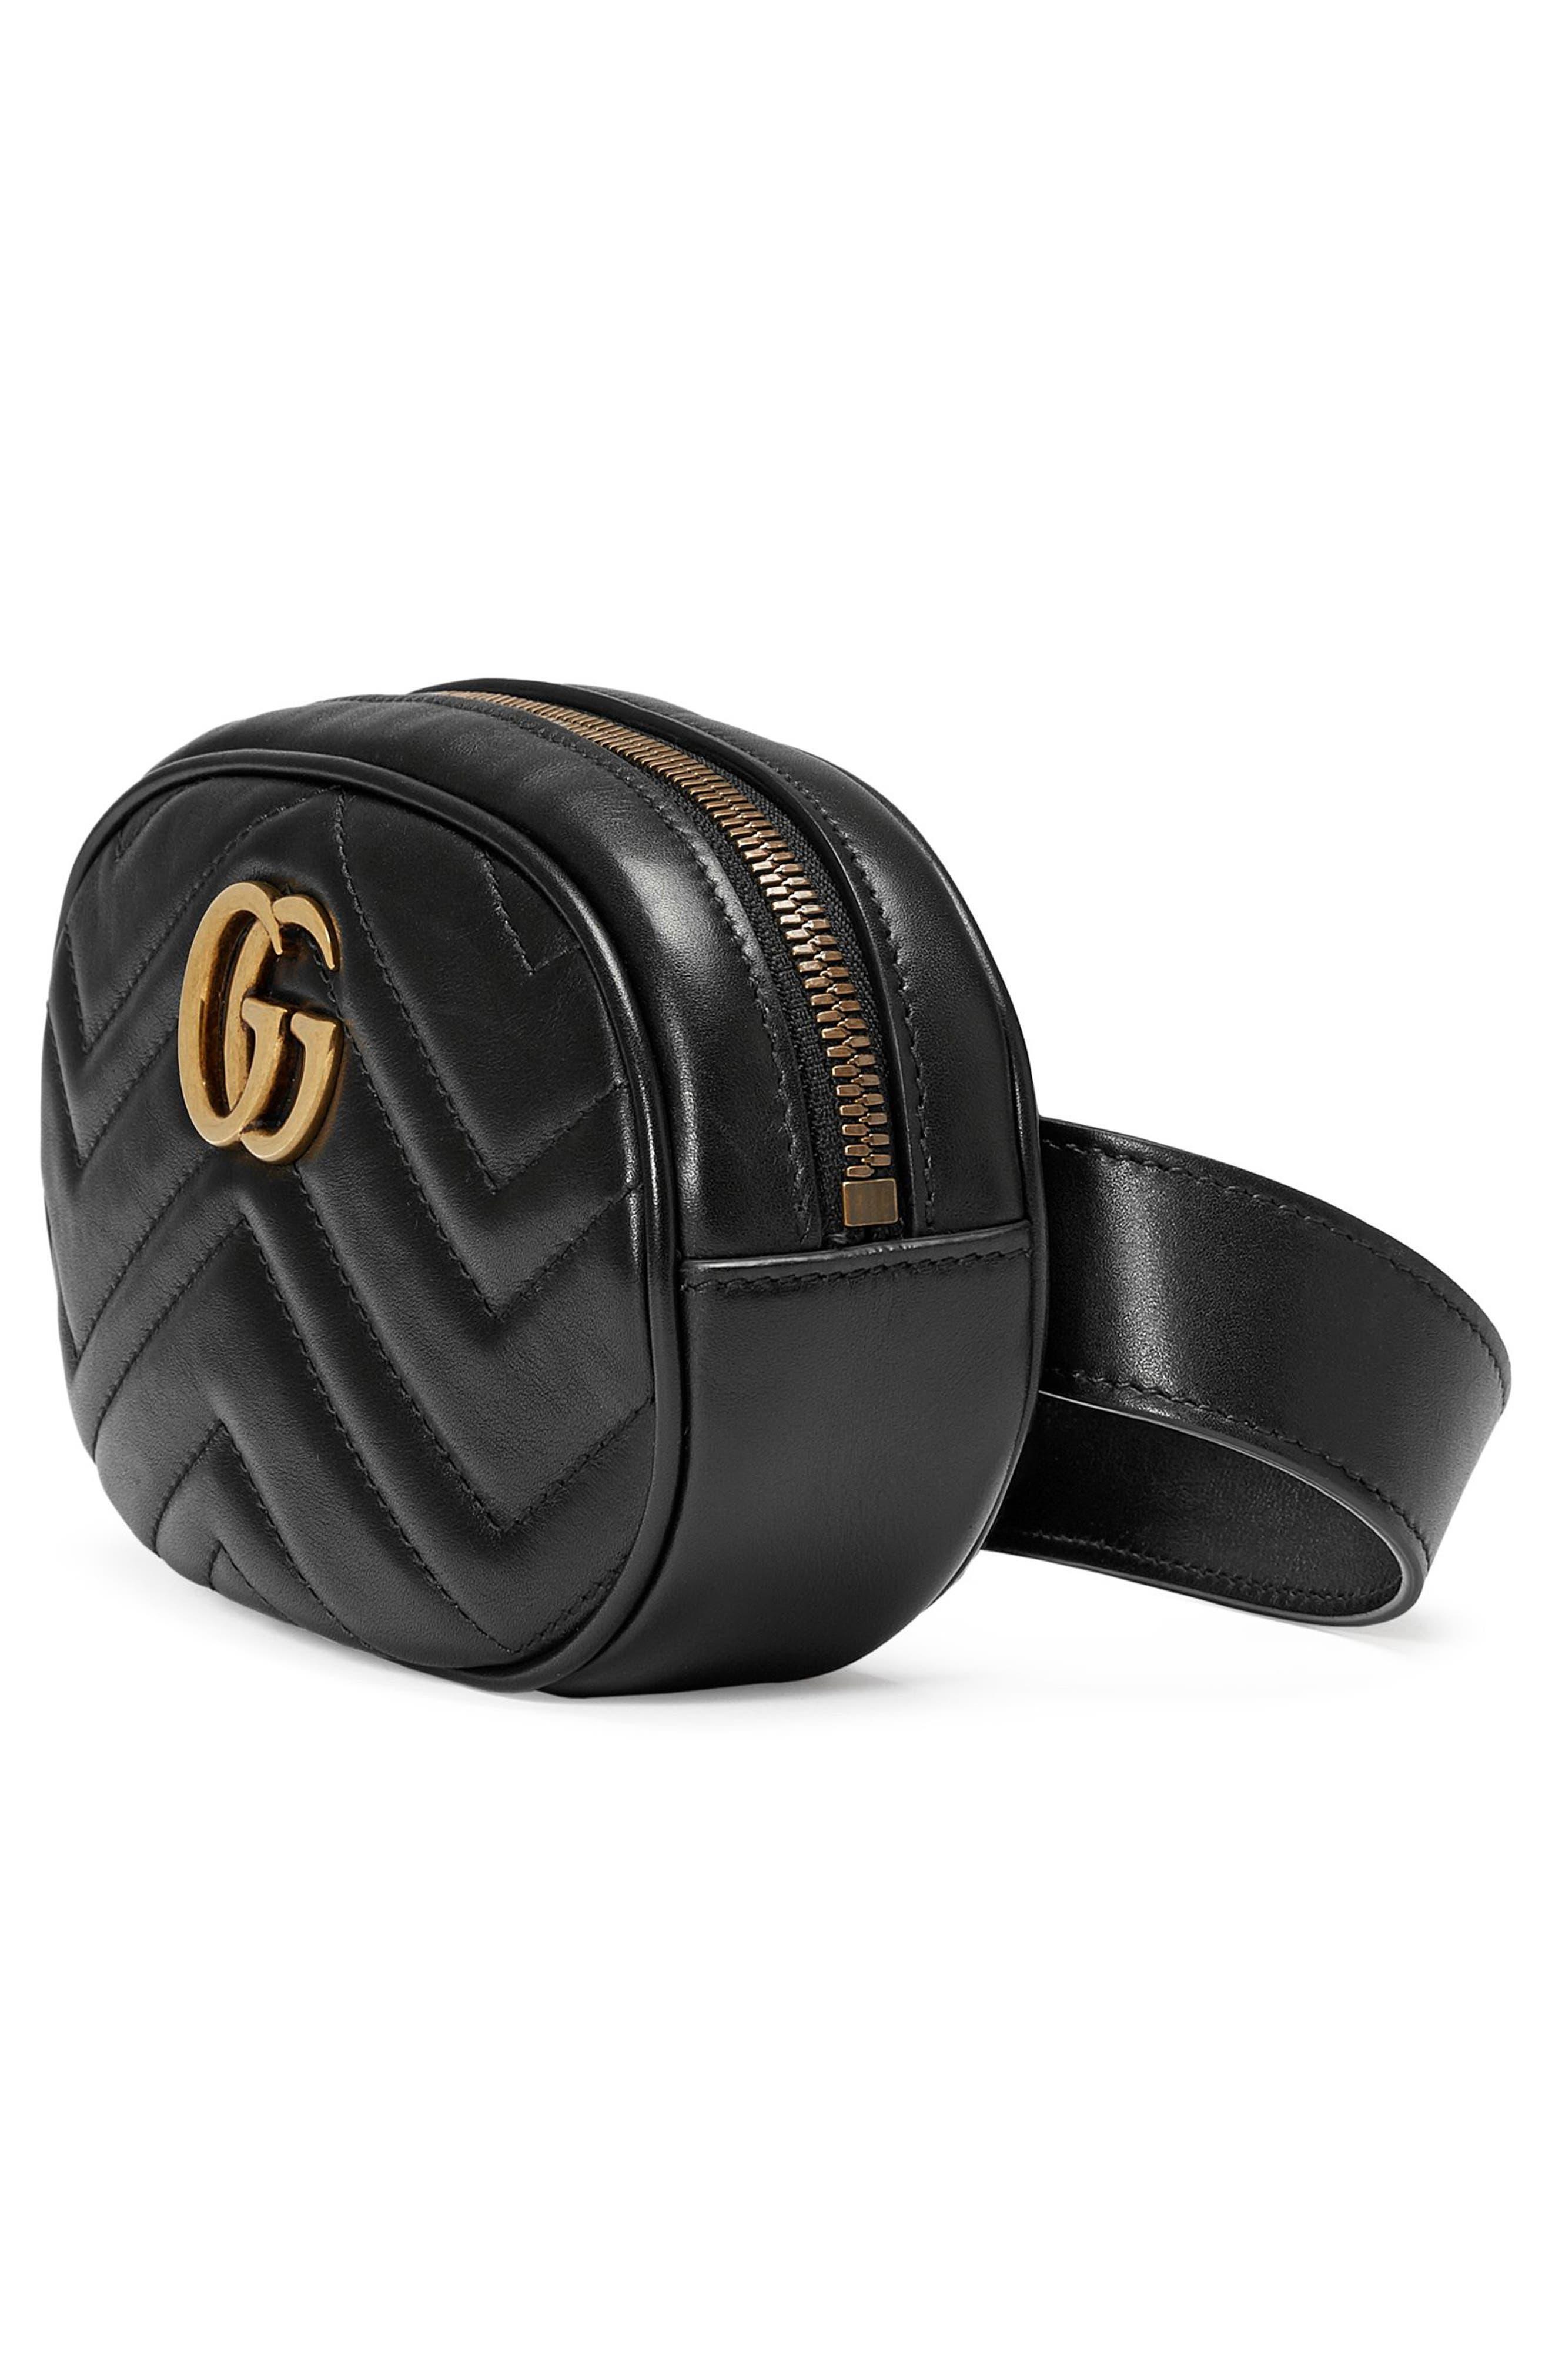 GG Marmont 2.0 Matelassé Leather Belt Bag,                             Alternate thumbnail 5, color,                             NERO